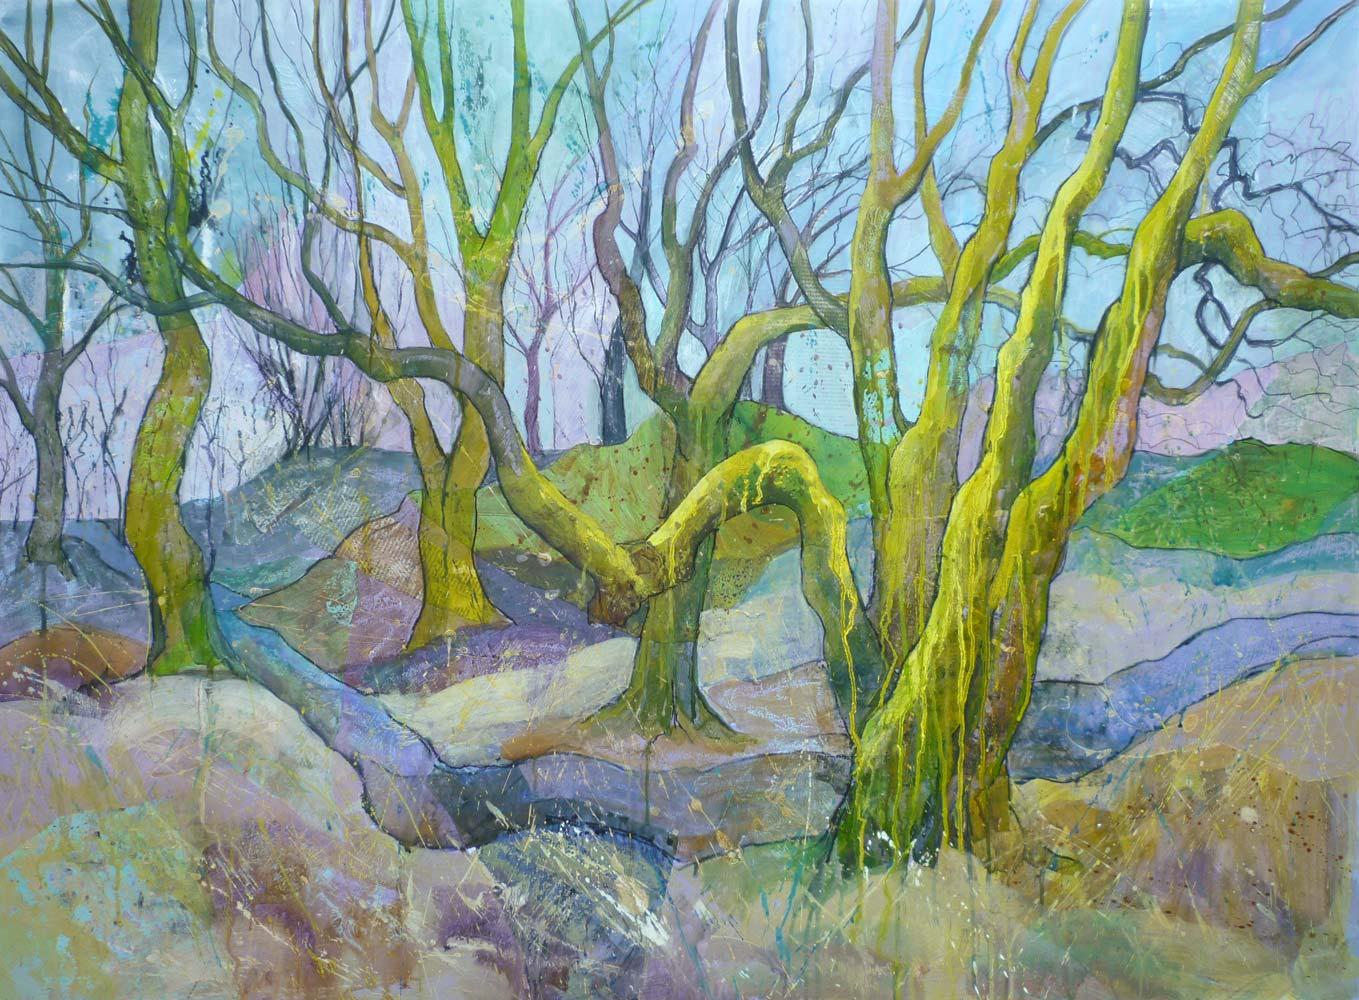 Mossy trees in Steeple Wood